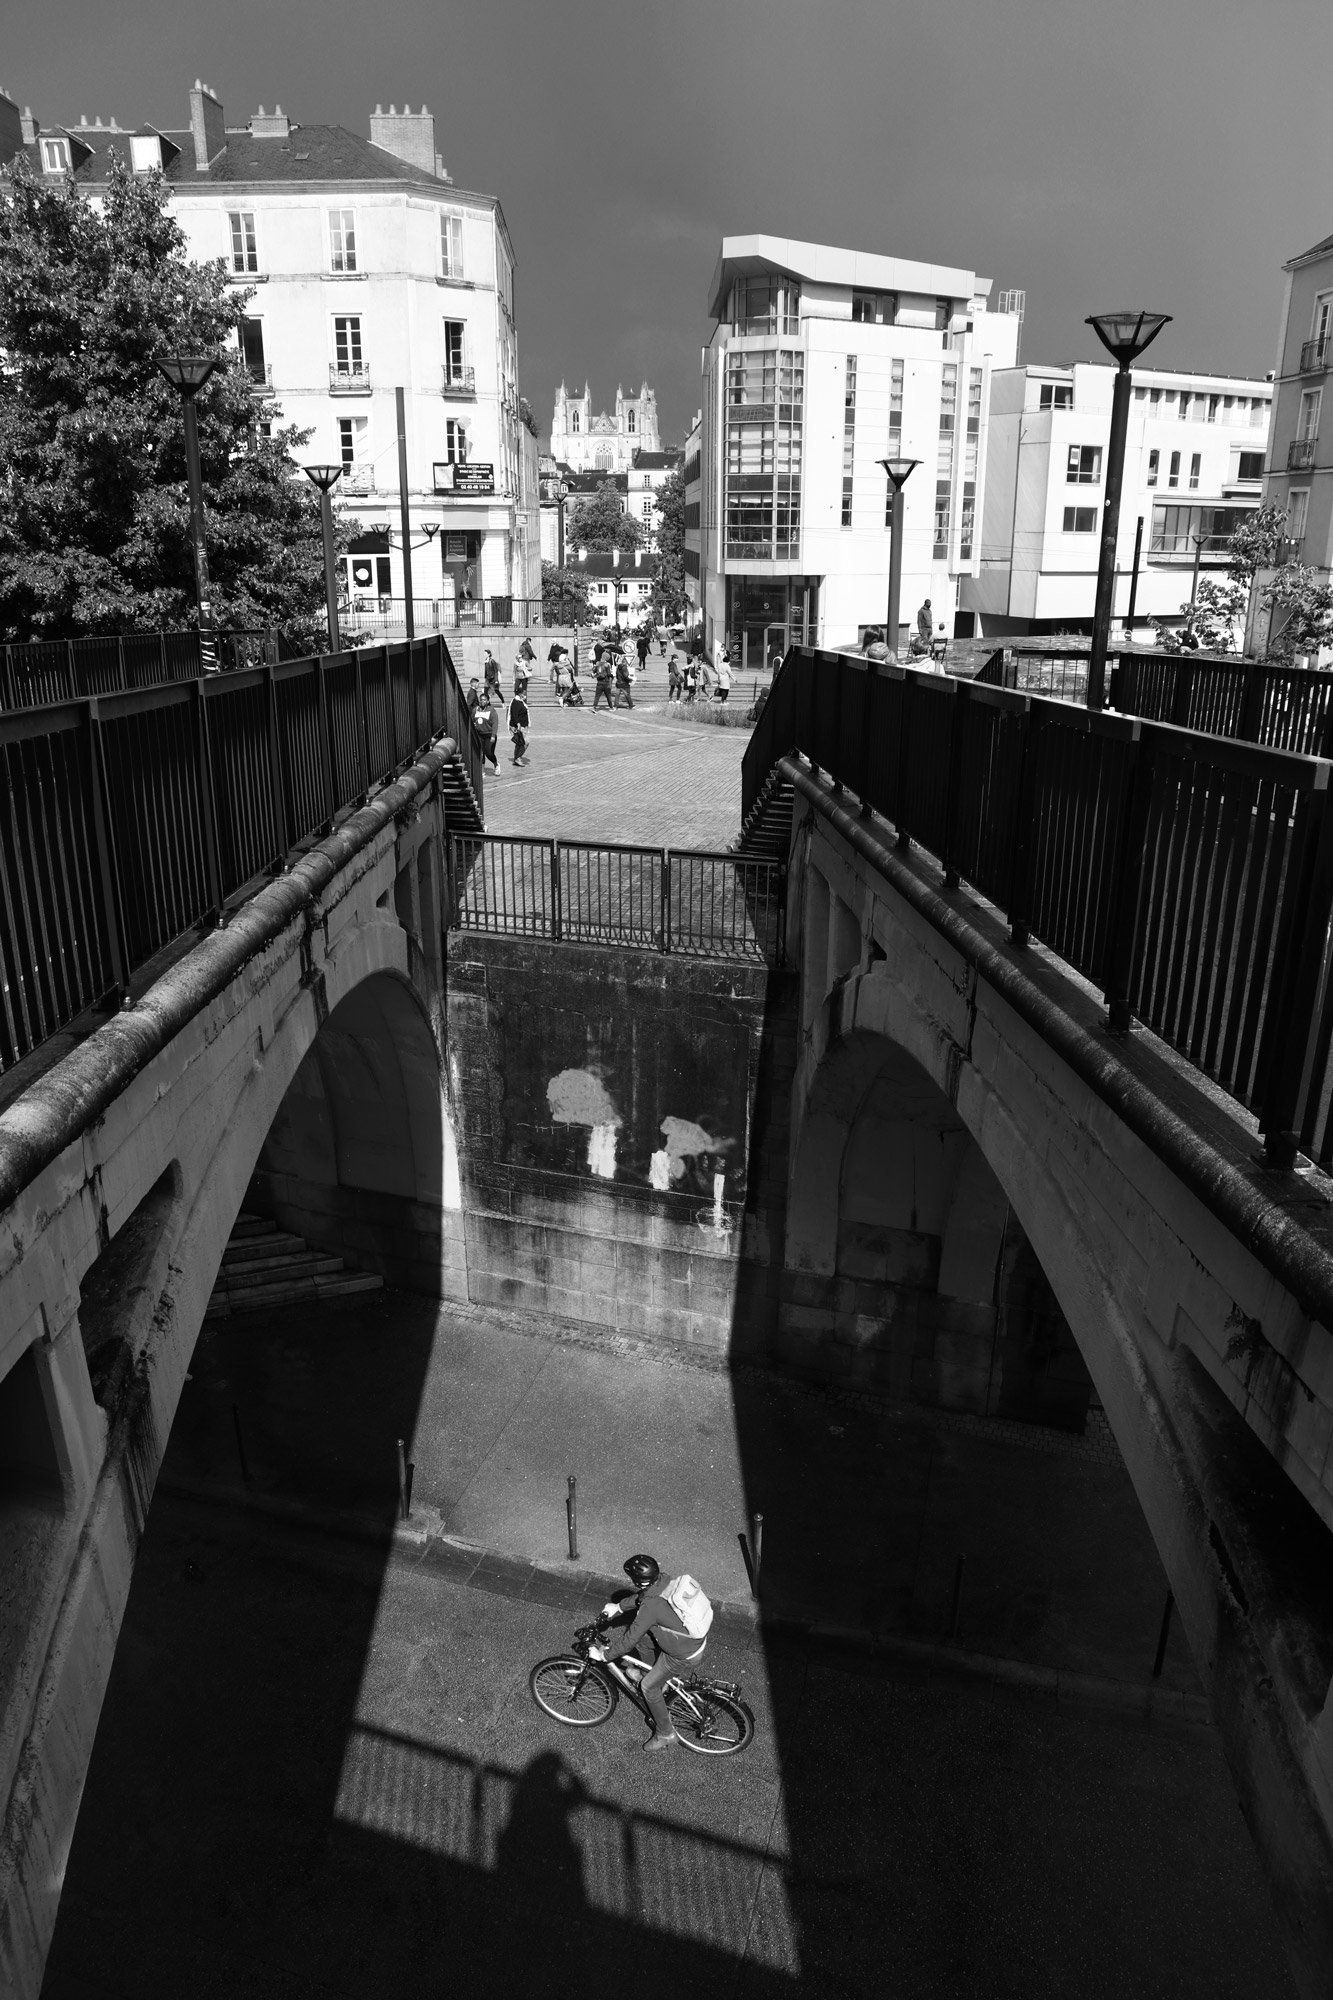 """Sunny or rainy time"" - Rue des 2 Ponts, Nantes. ©Clémence Rougetet"